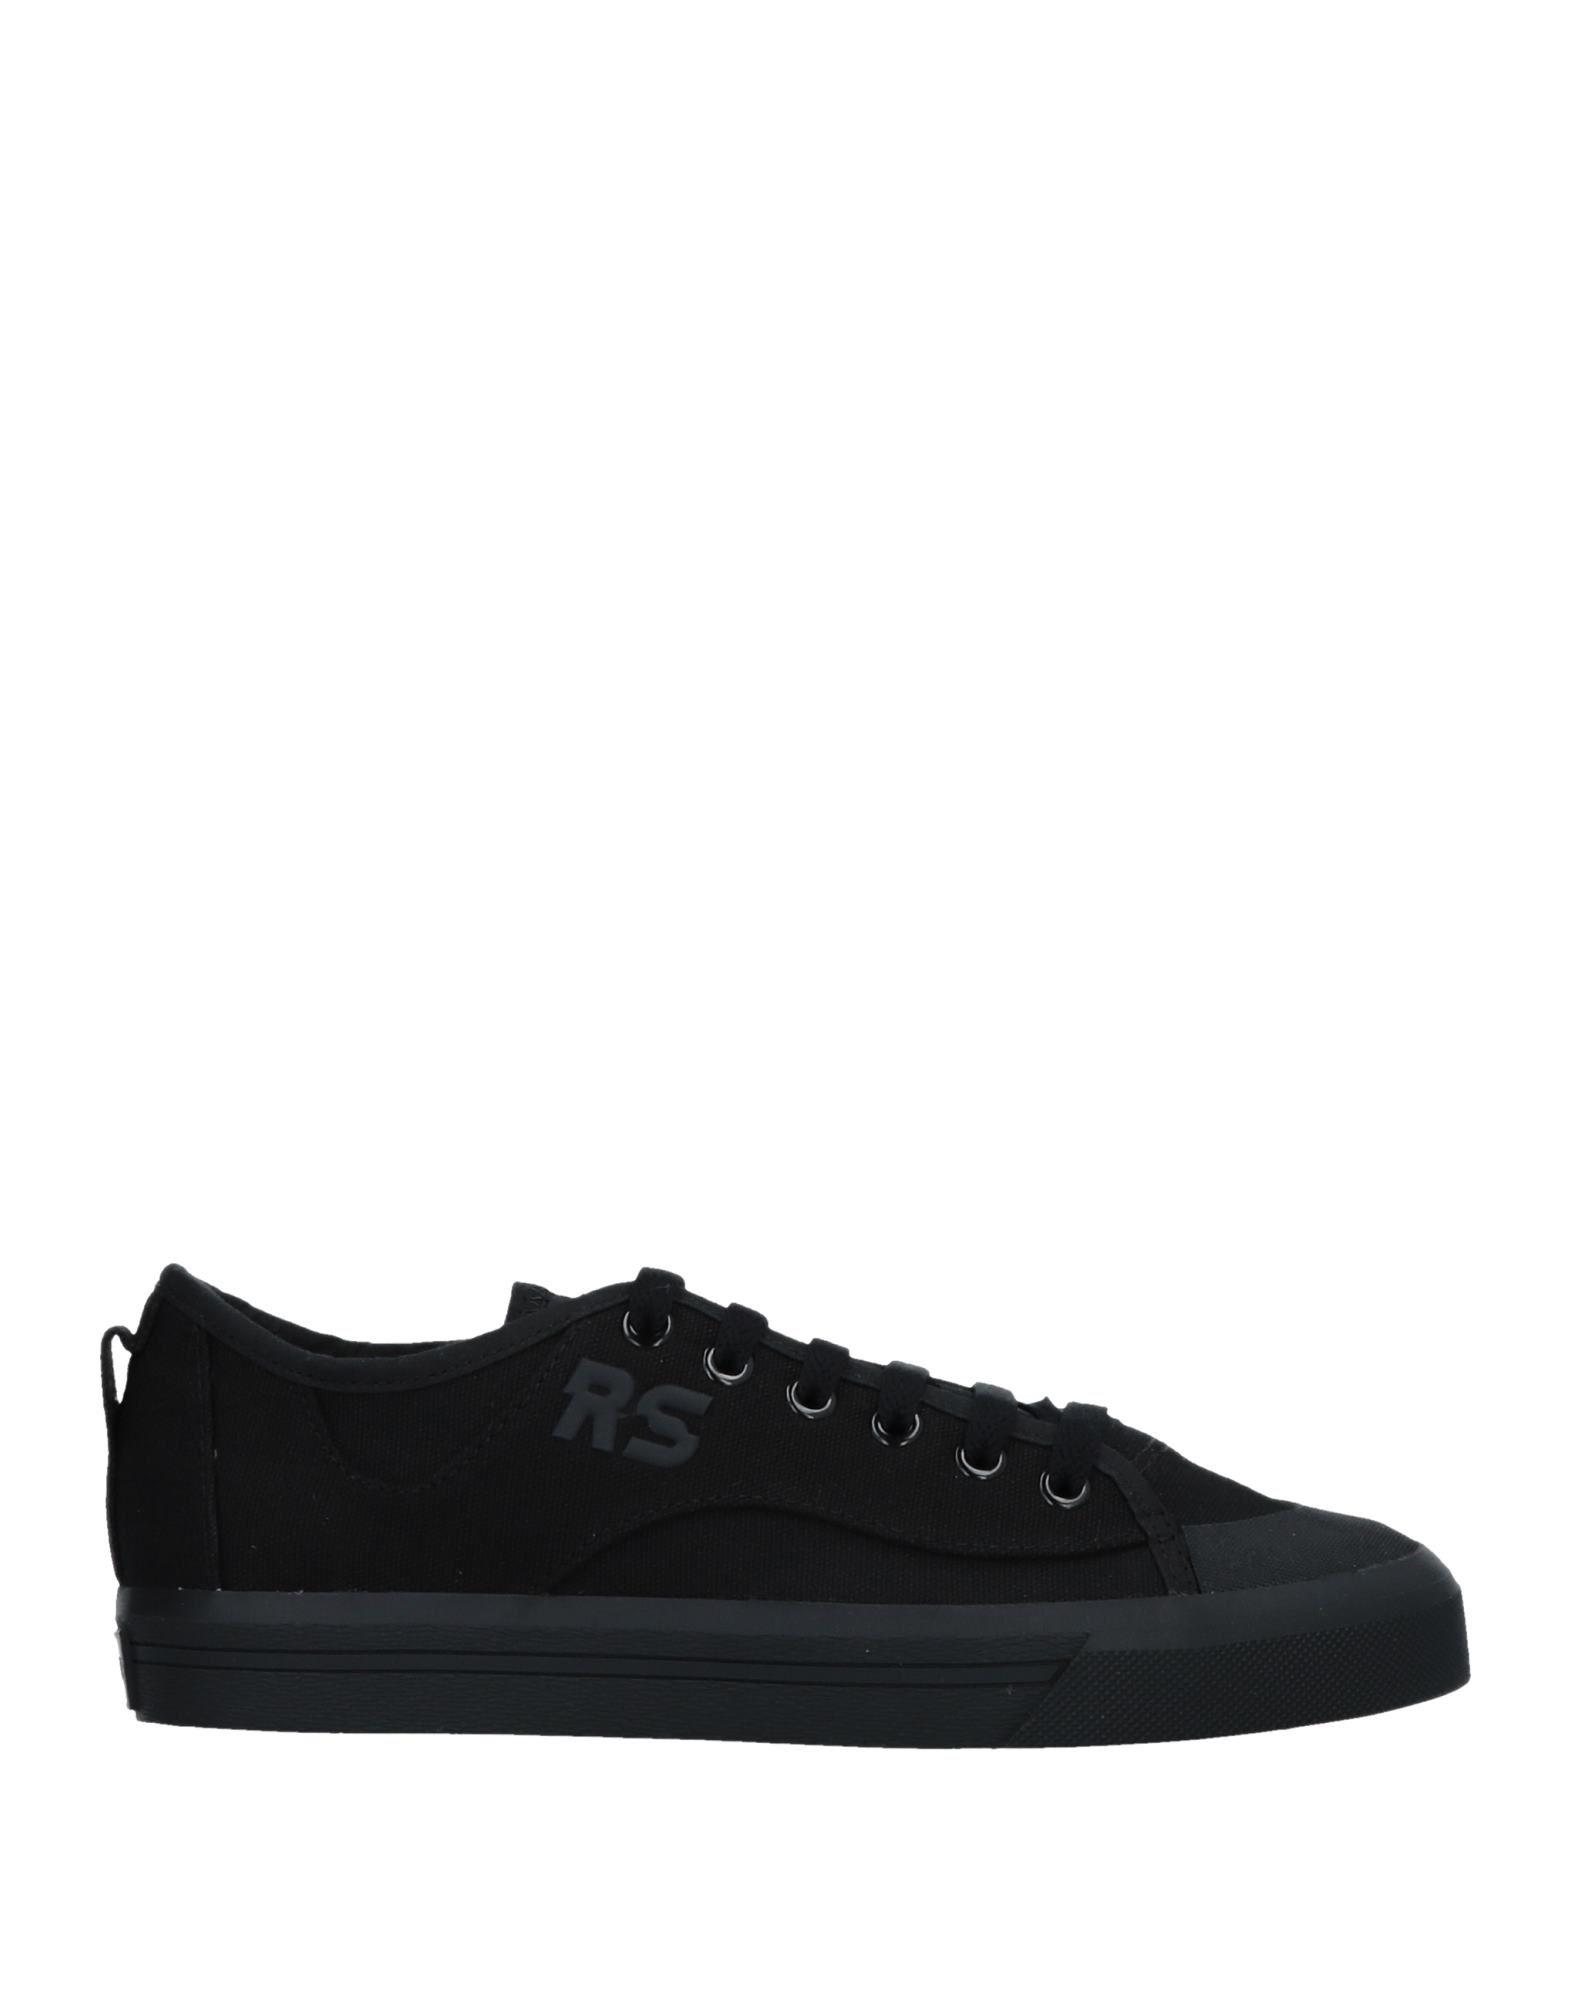 Adidas By Raf Simons Sneakers Herren  11504629QB Gute Qualität beliebte Schuhe